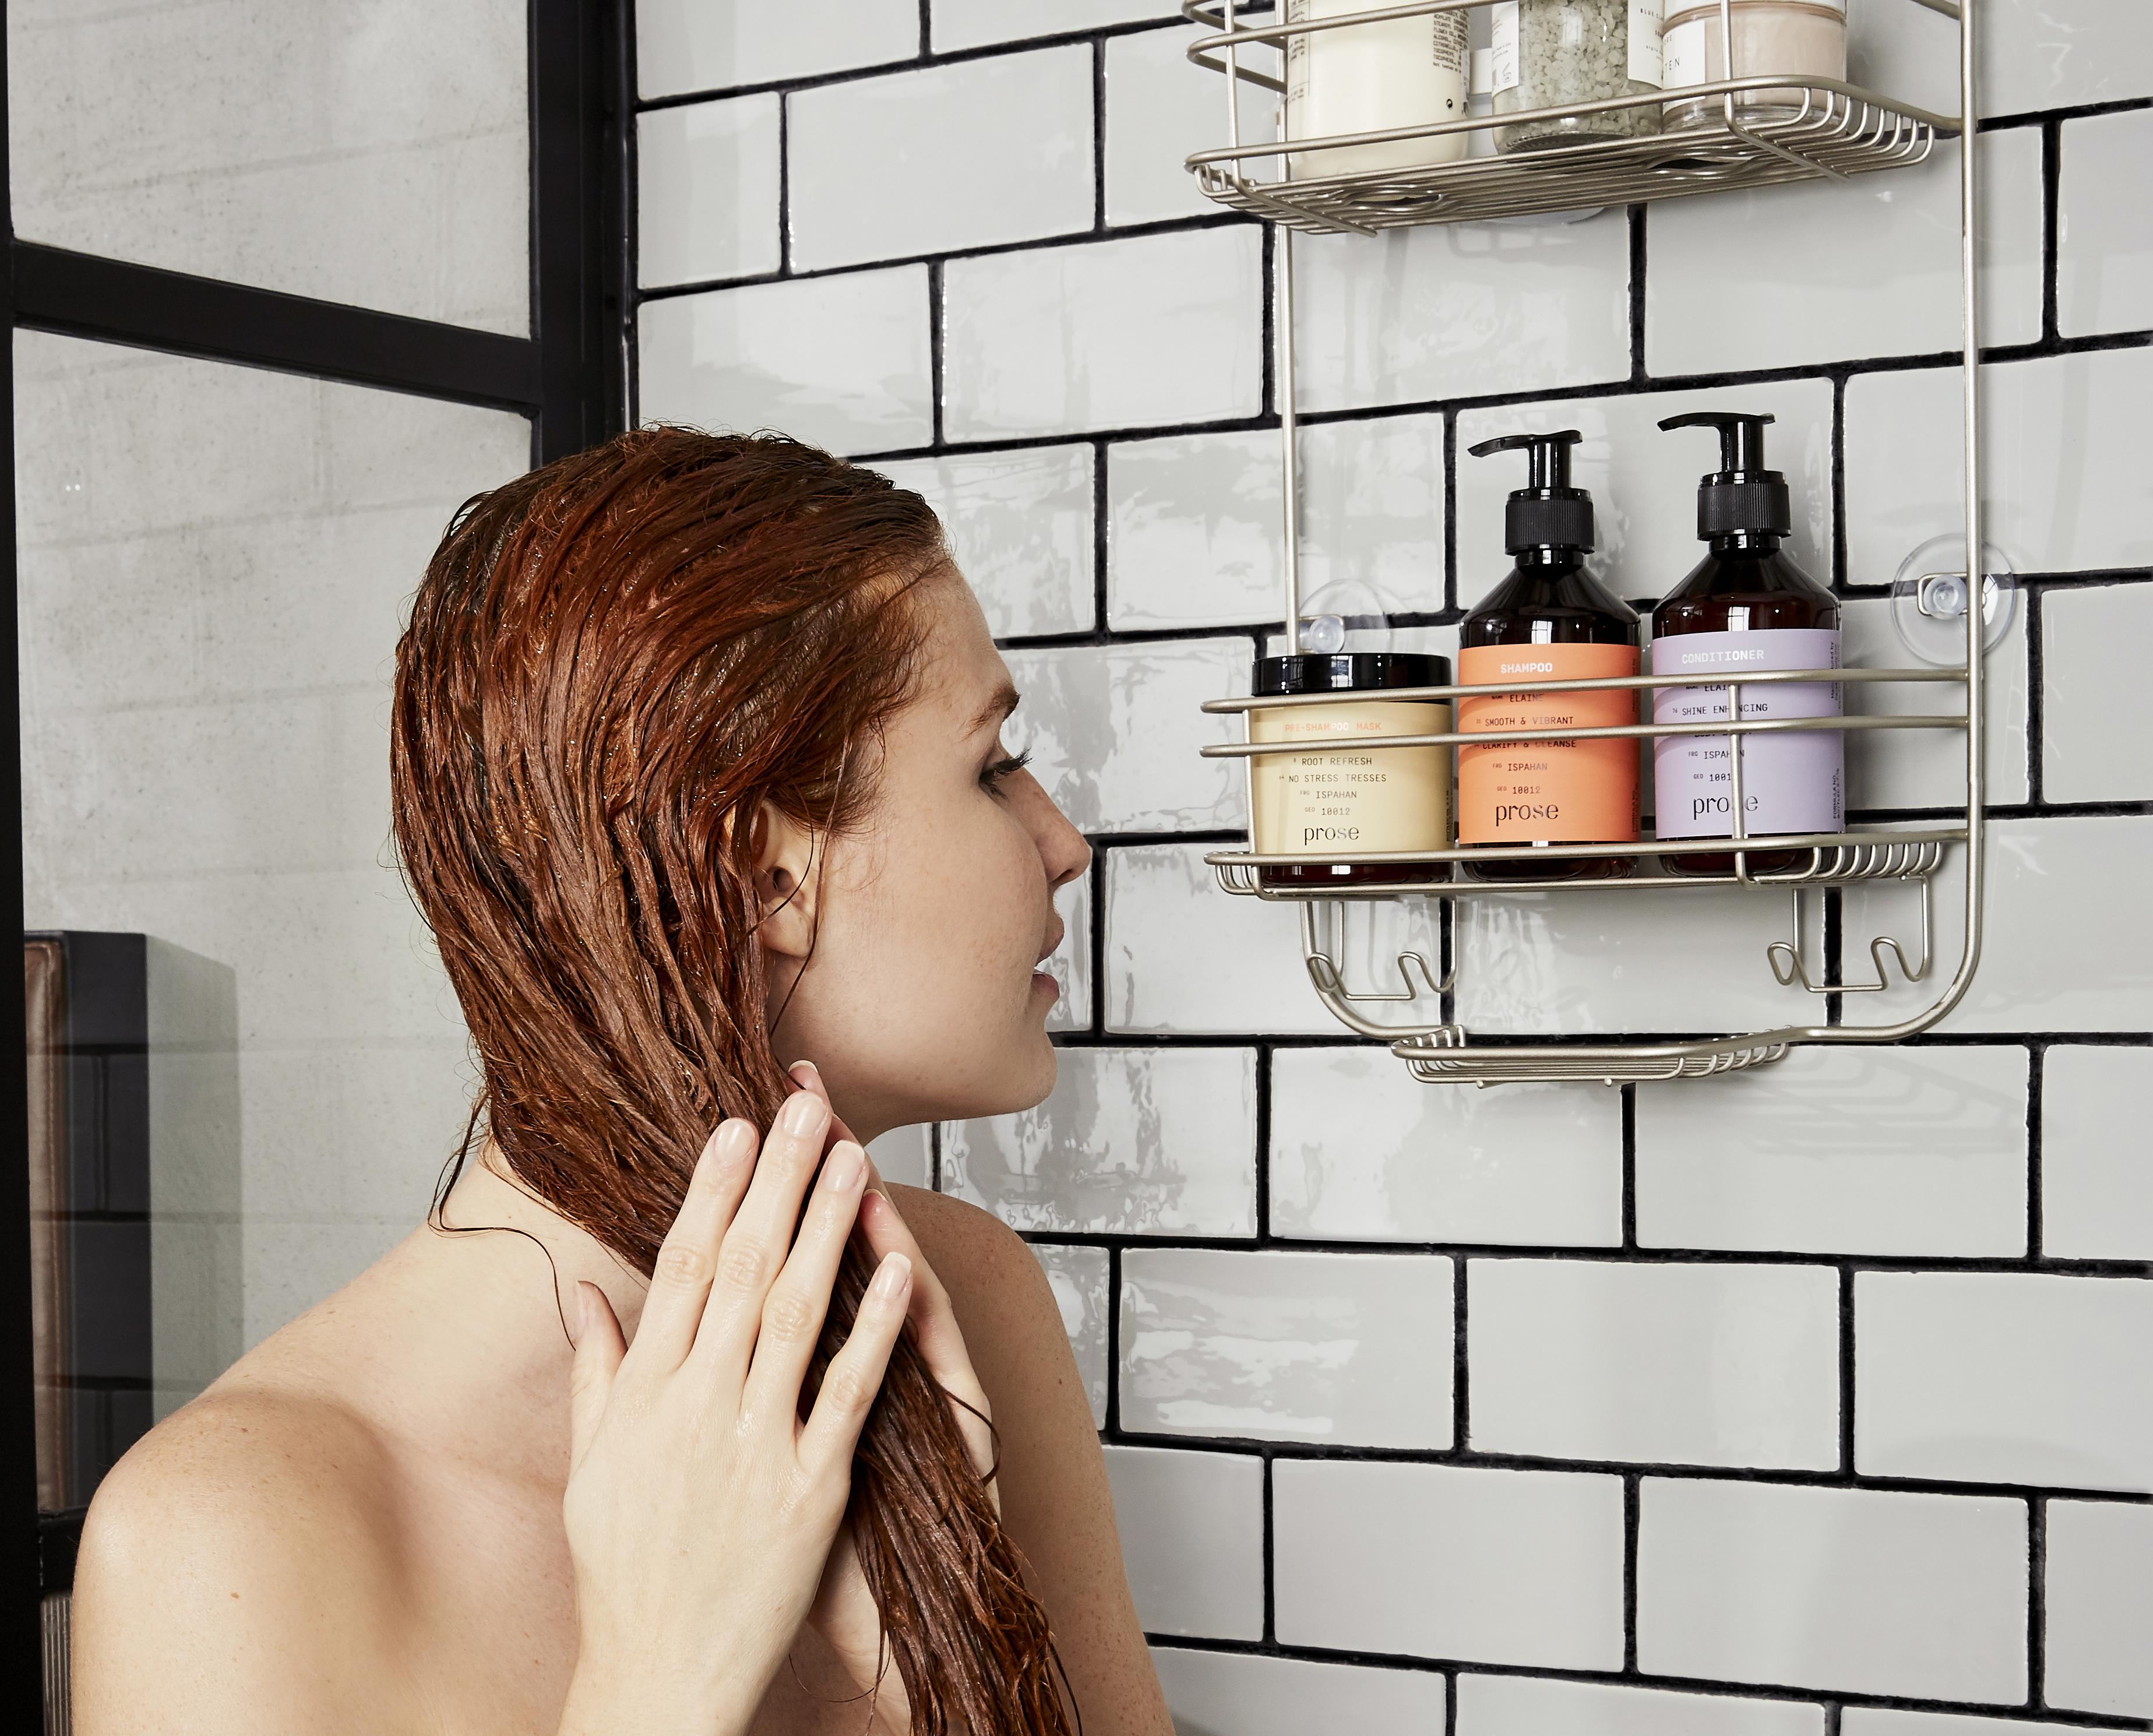 tea rinse Prose hair care model